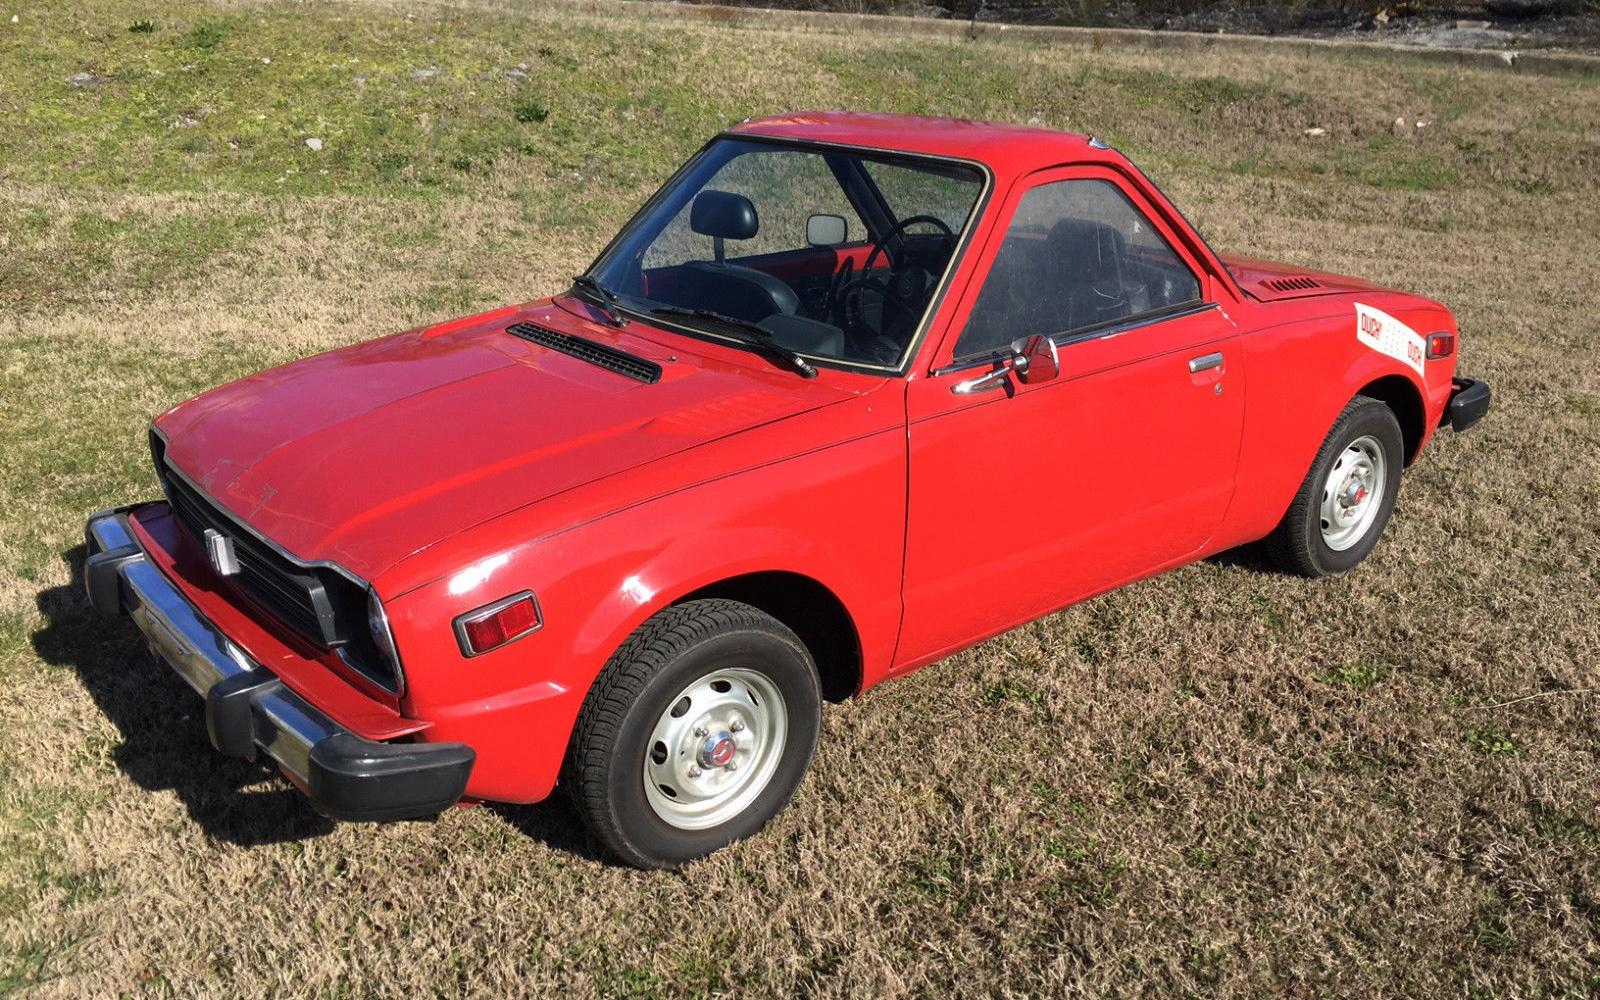 Honda Parts Cheap >> Seeing Double: 1979 Honda Civic x 2